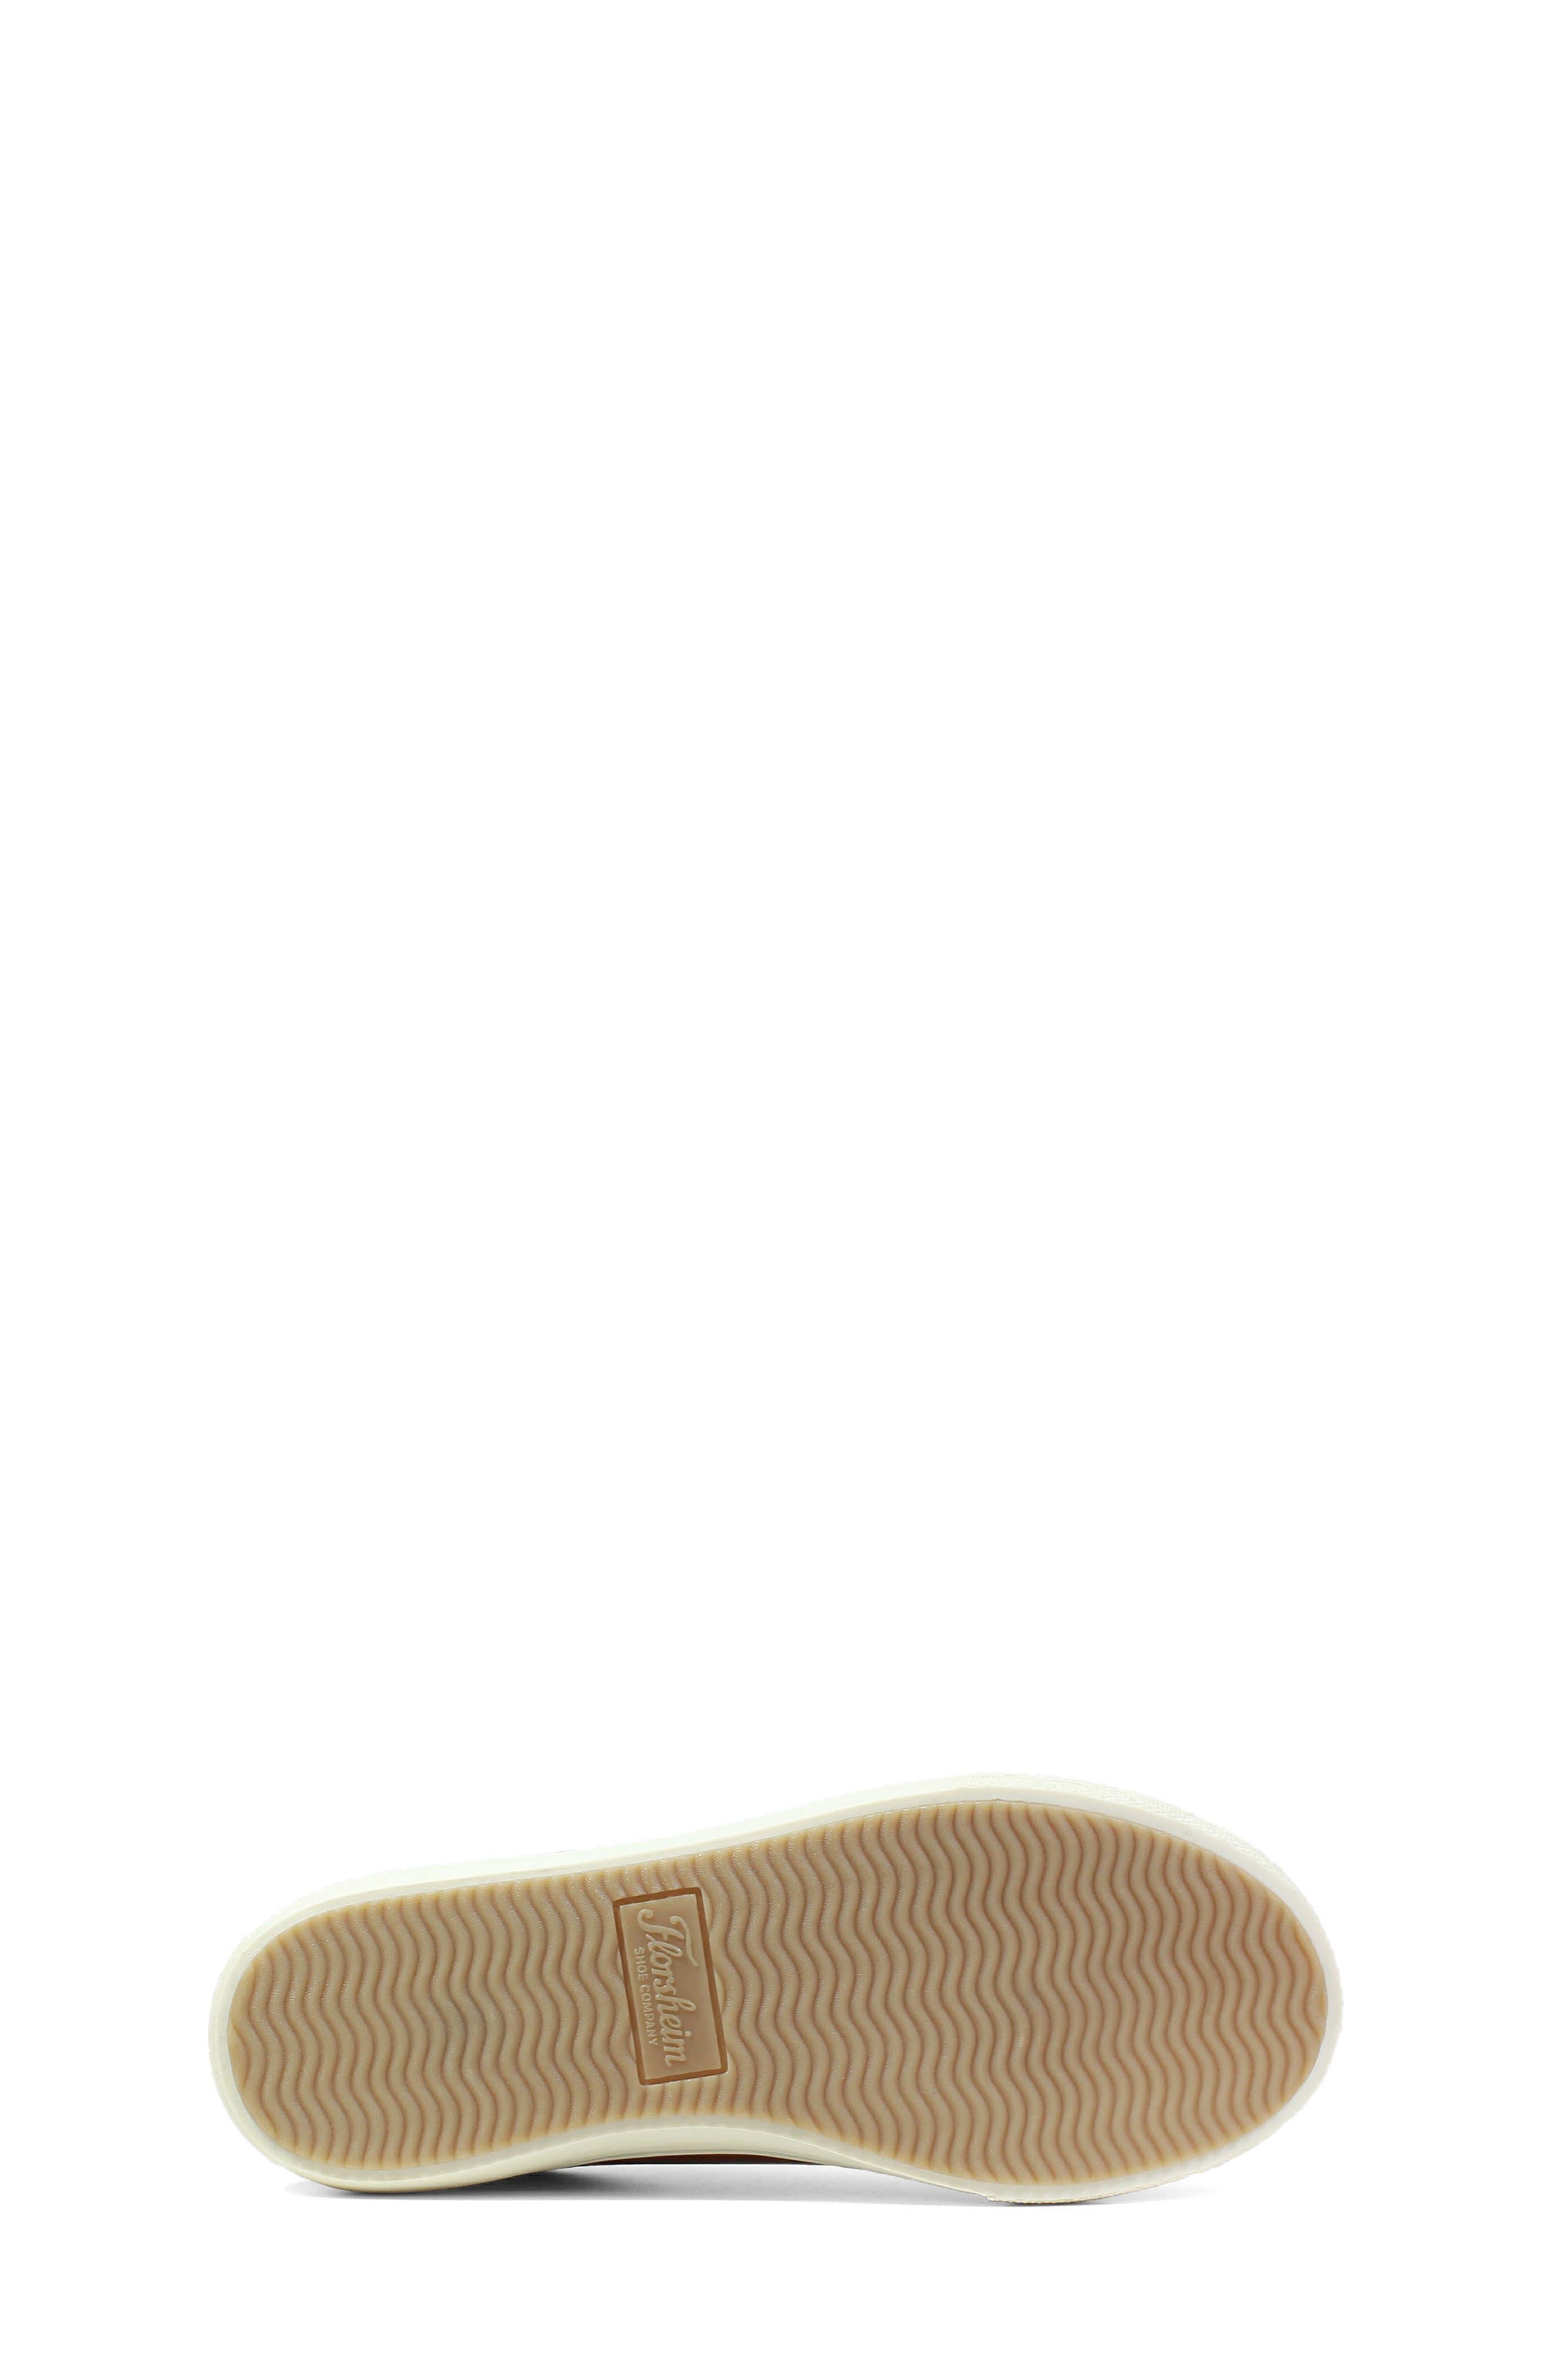 Curb Elastic Lace Sneaker,                             Alternate thumbnail 5, color,                             Cognac